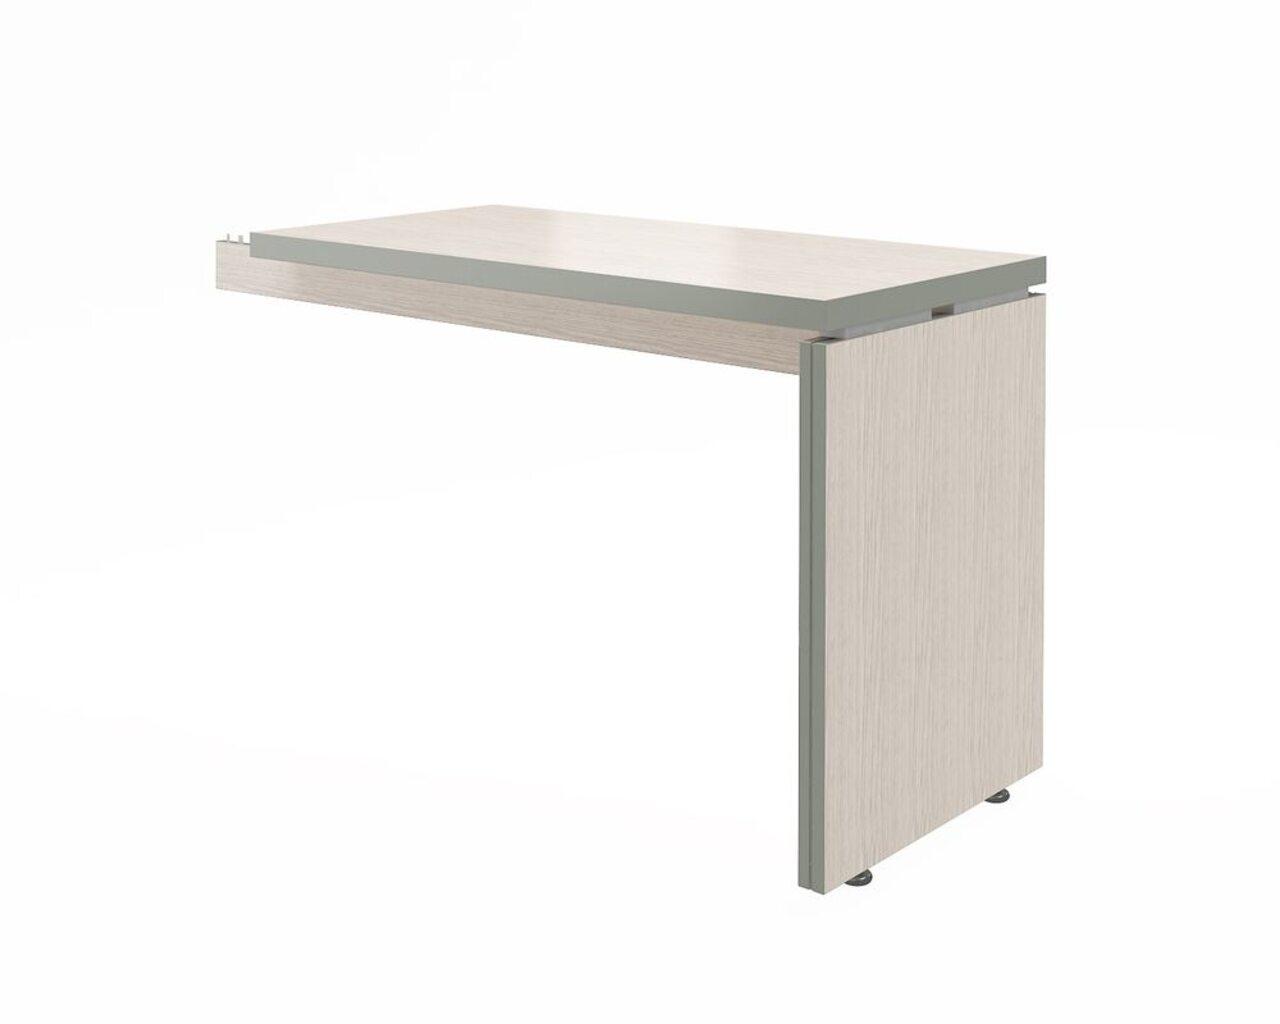 Стол приставной боковой  Bella VITA 110x55x77 - фото 1